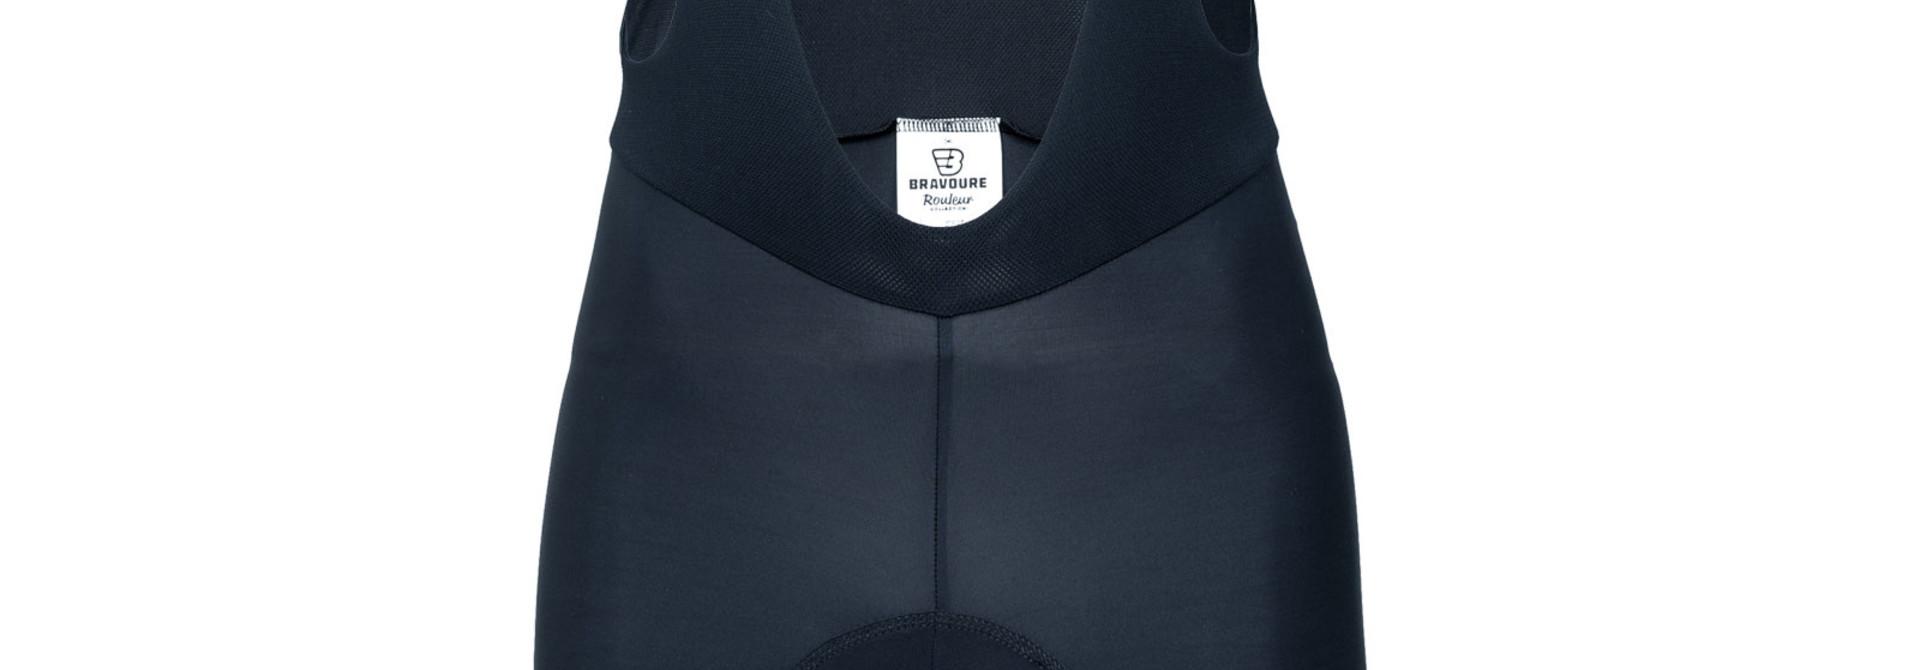 Men's Rouleur Bib Shorts | Black